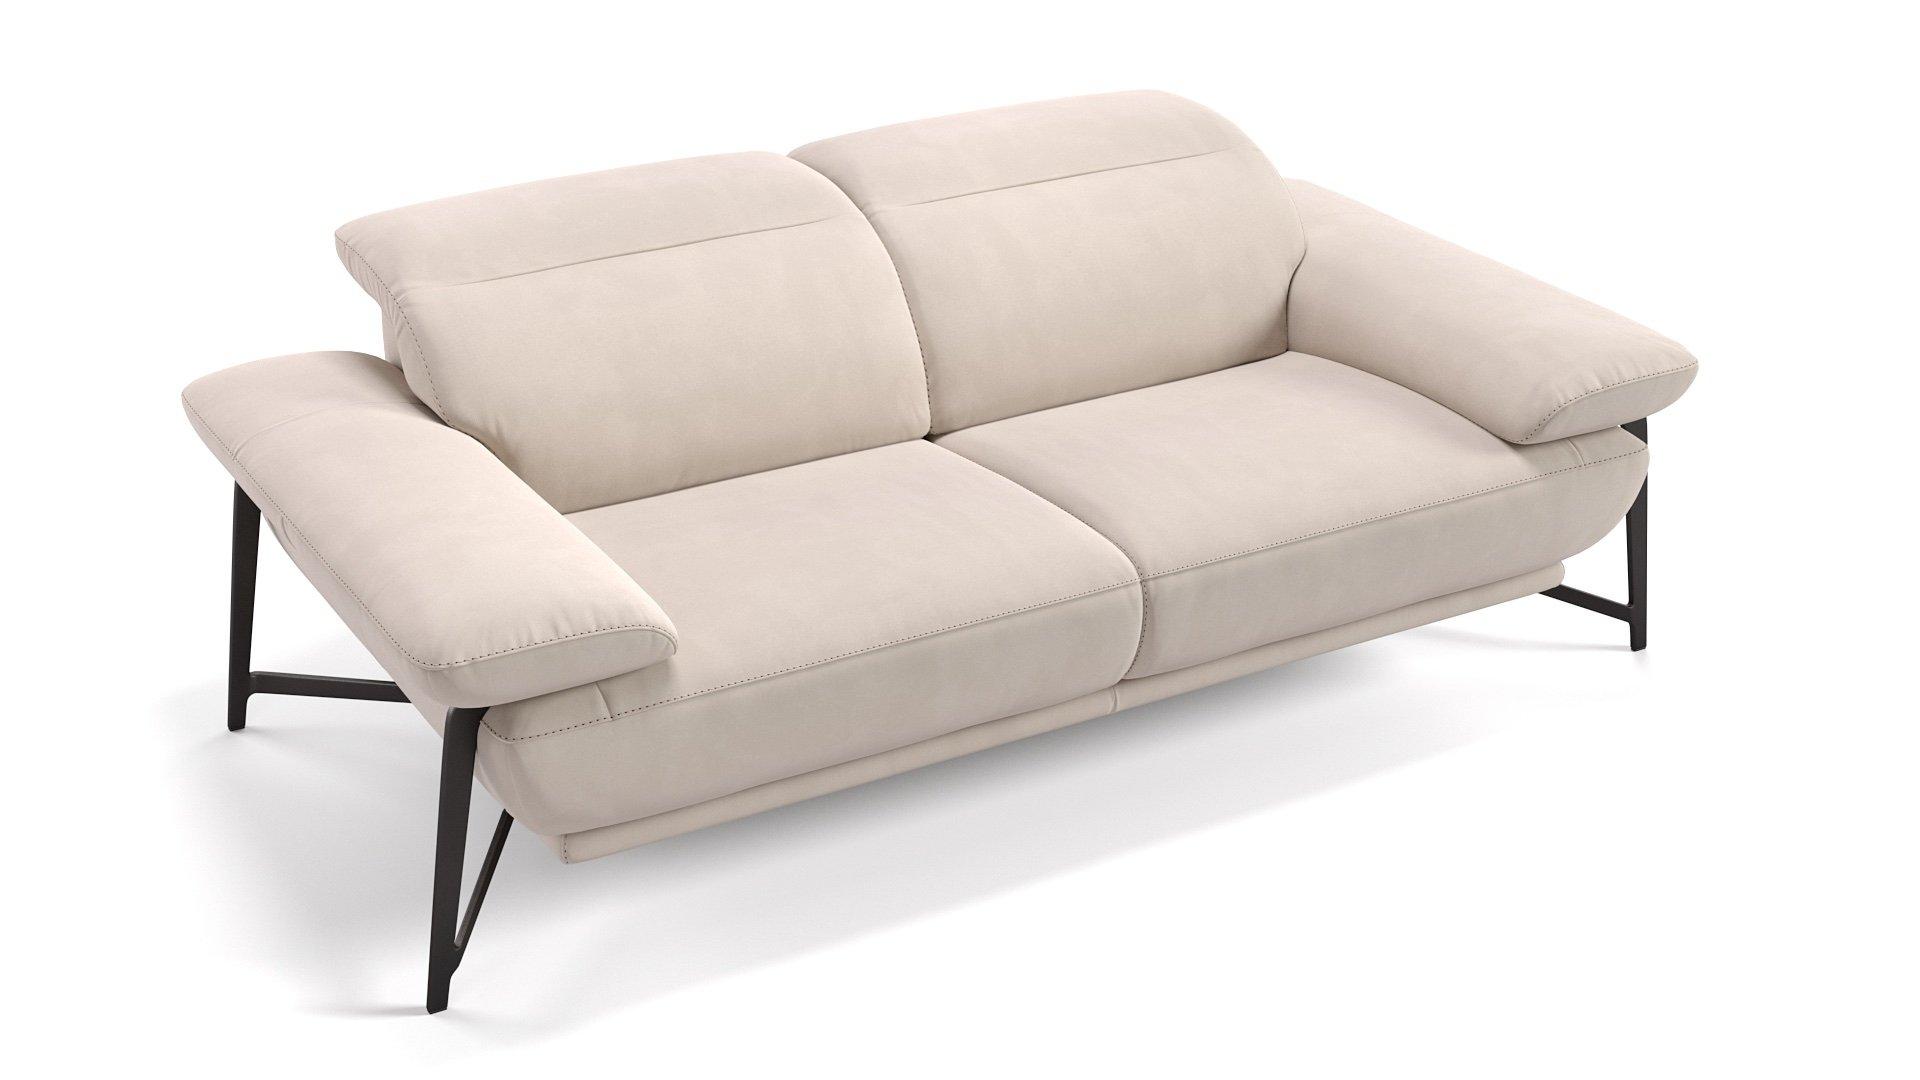 Stoff 2-Sitzer Sofa BIANCO